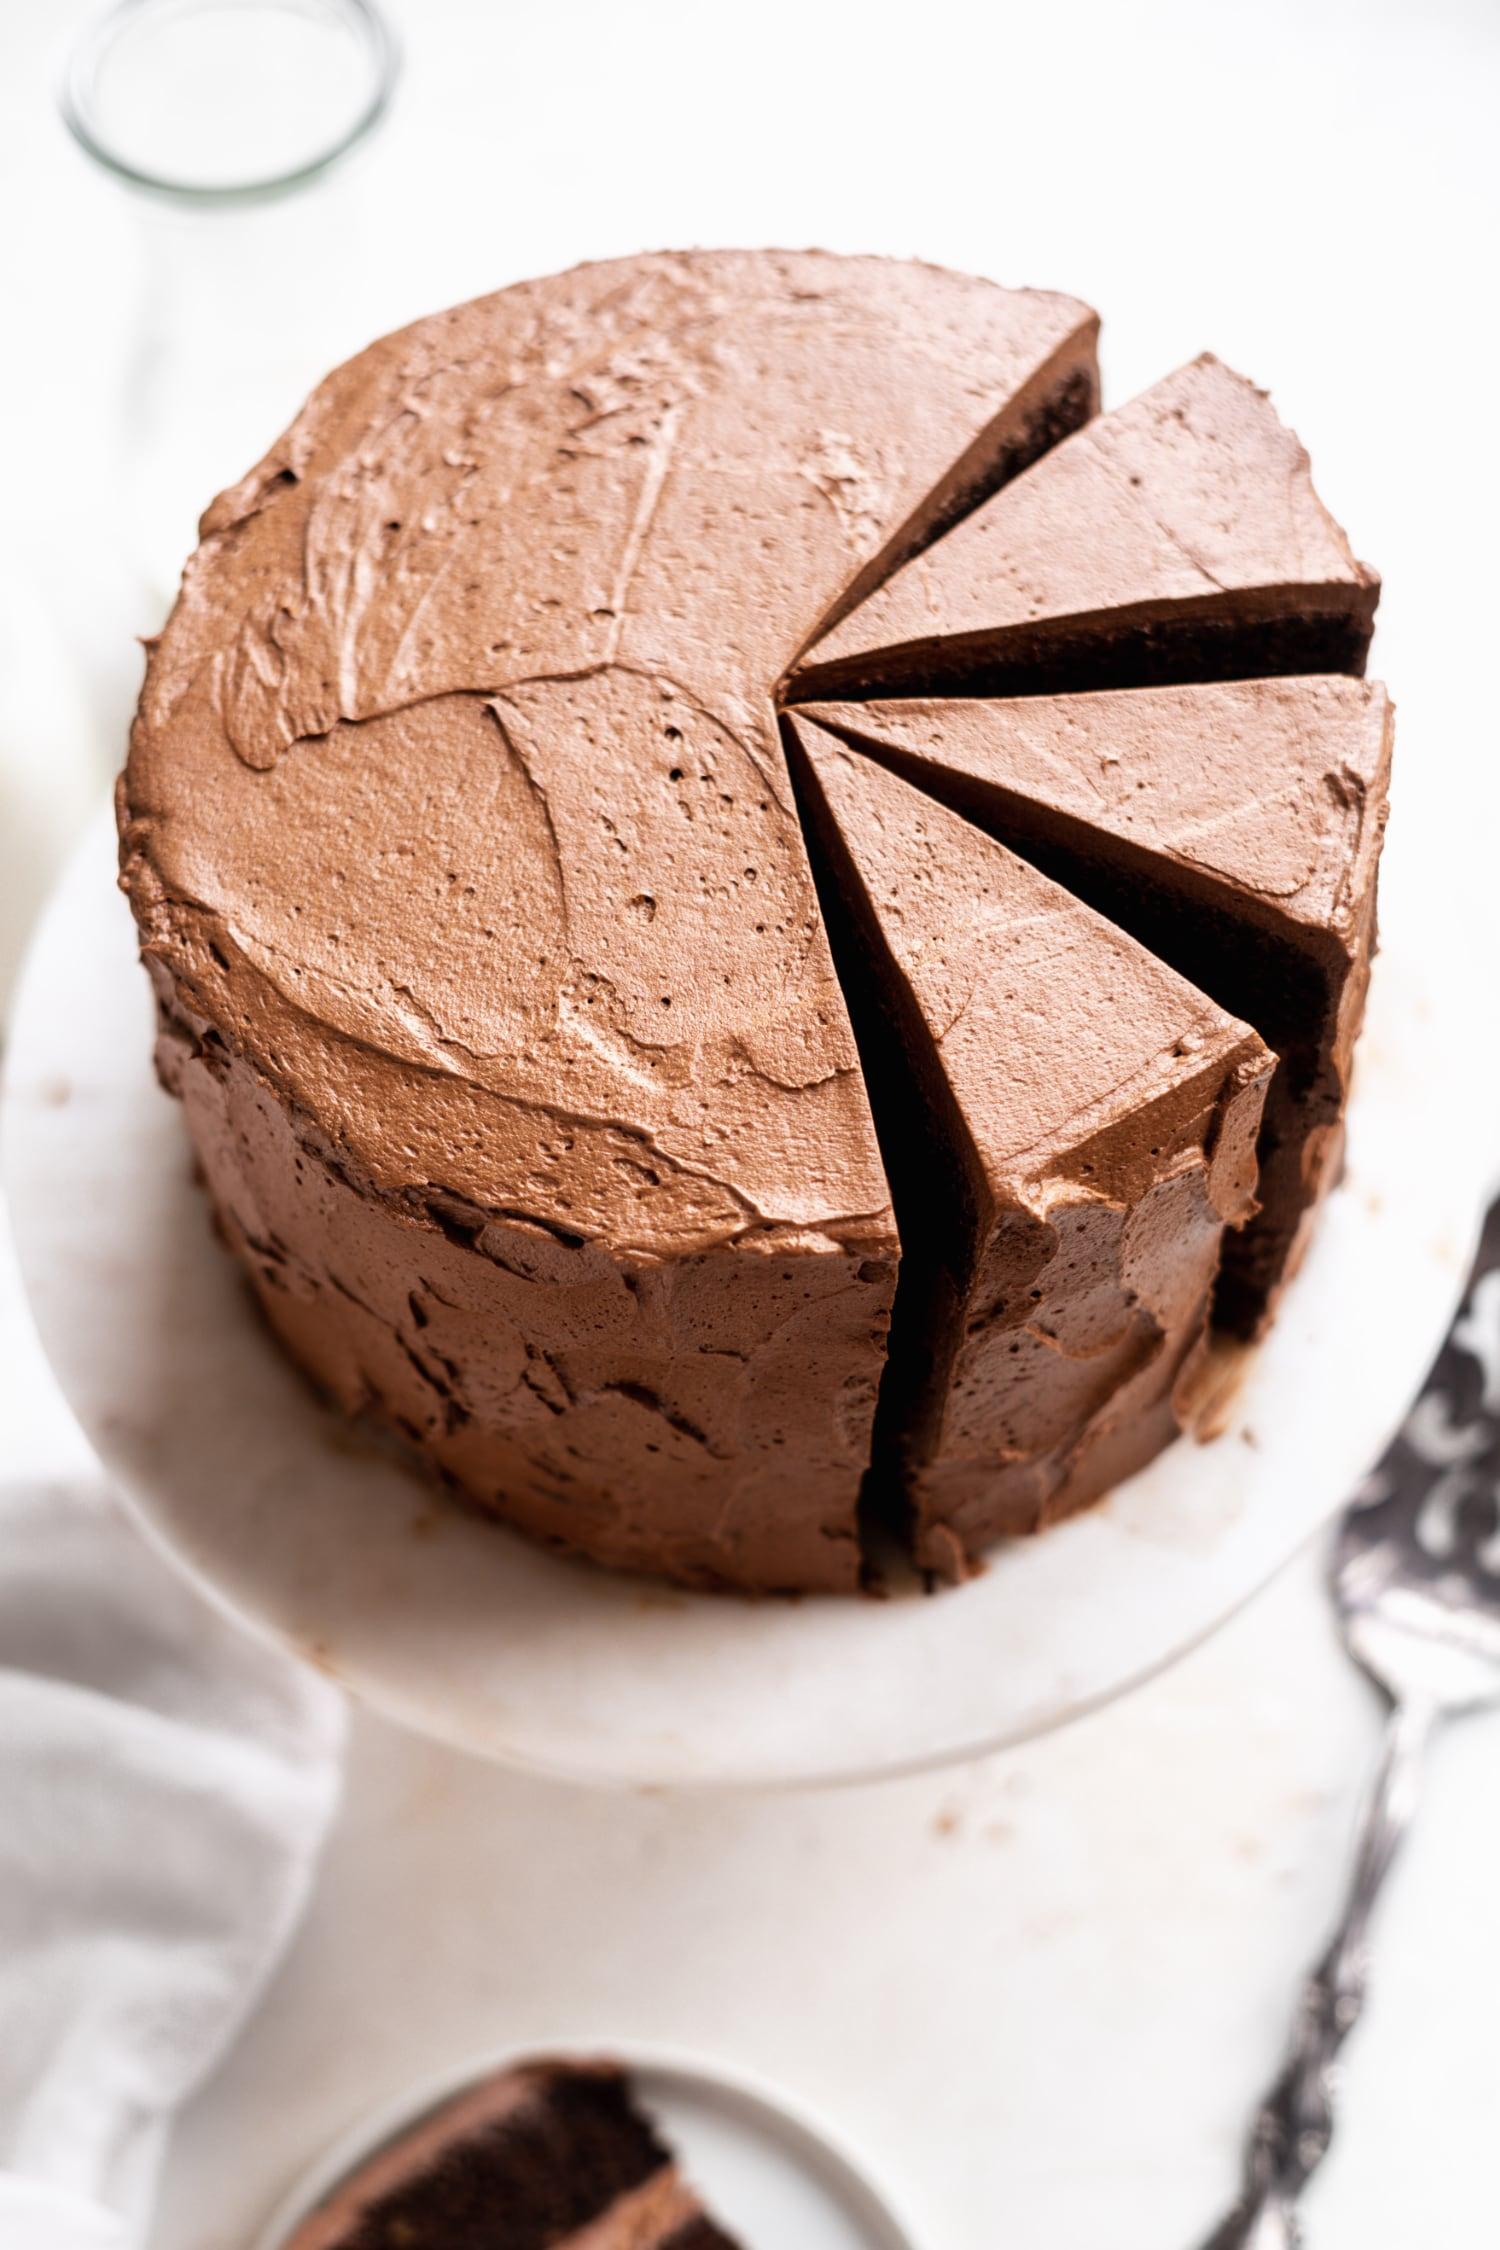 paleo chocolate frosting on a paleo chocolate cake